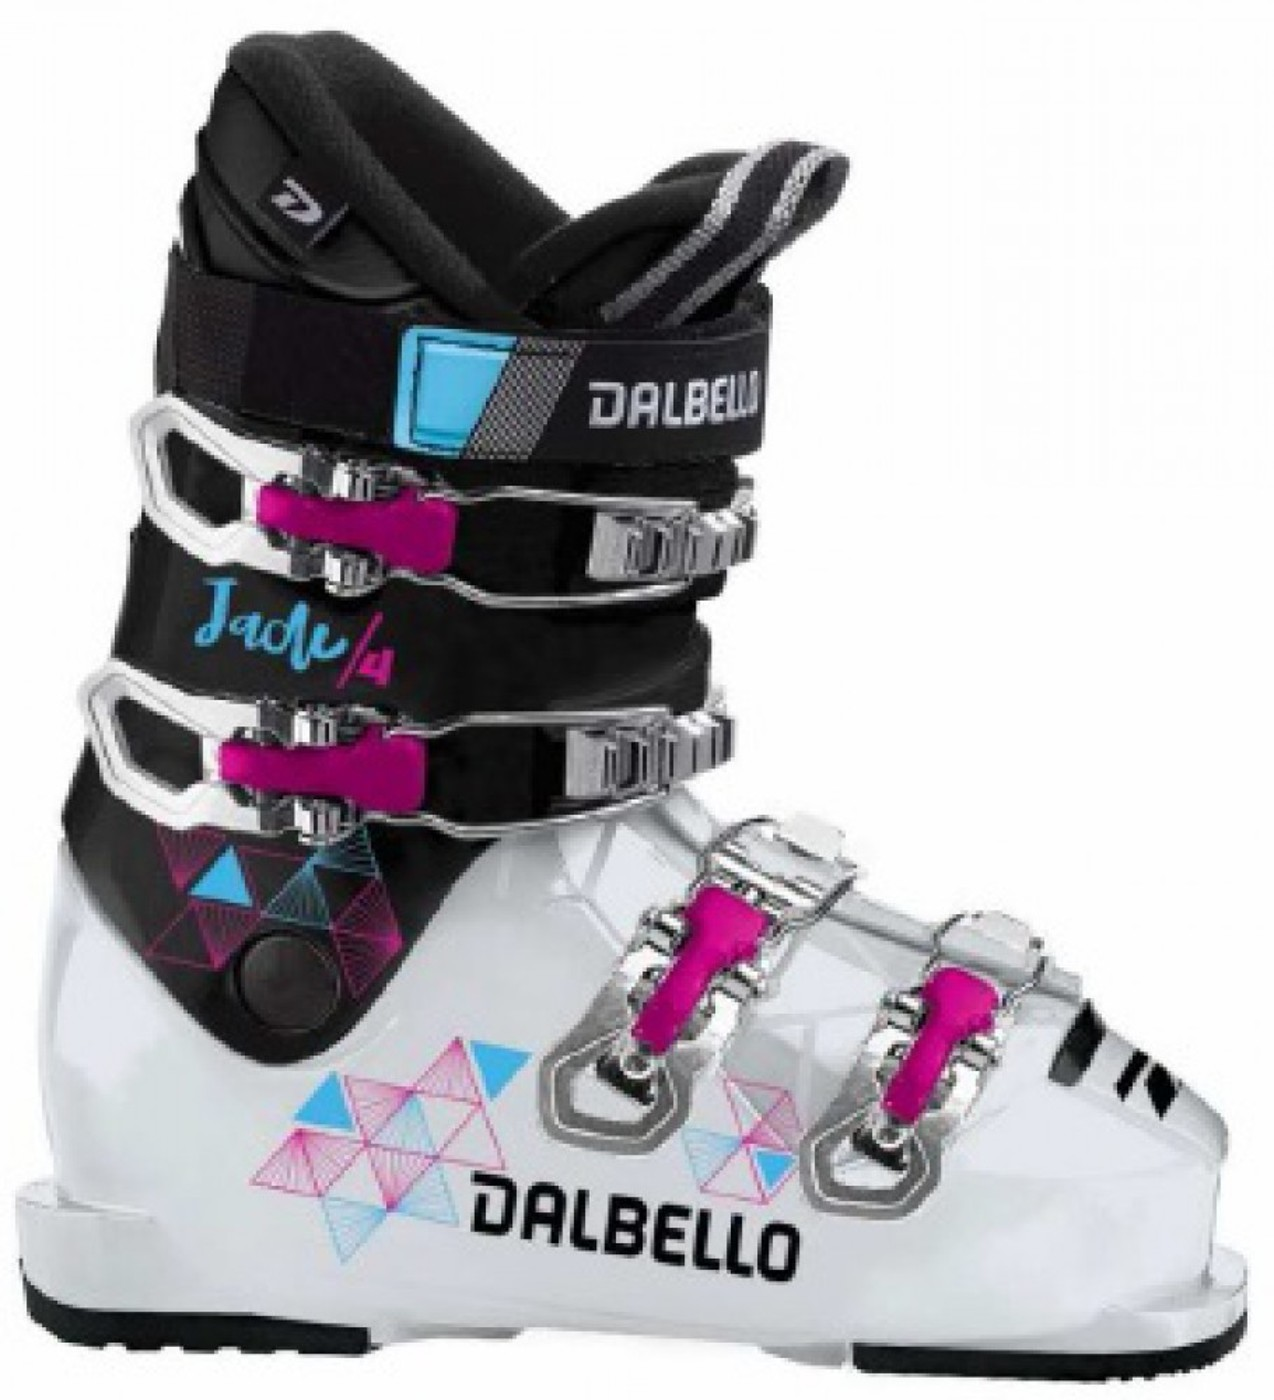 DALBELLO JADE 4.0 - Kinder